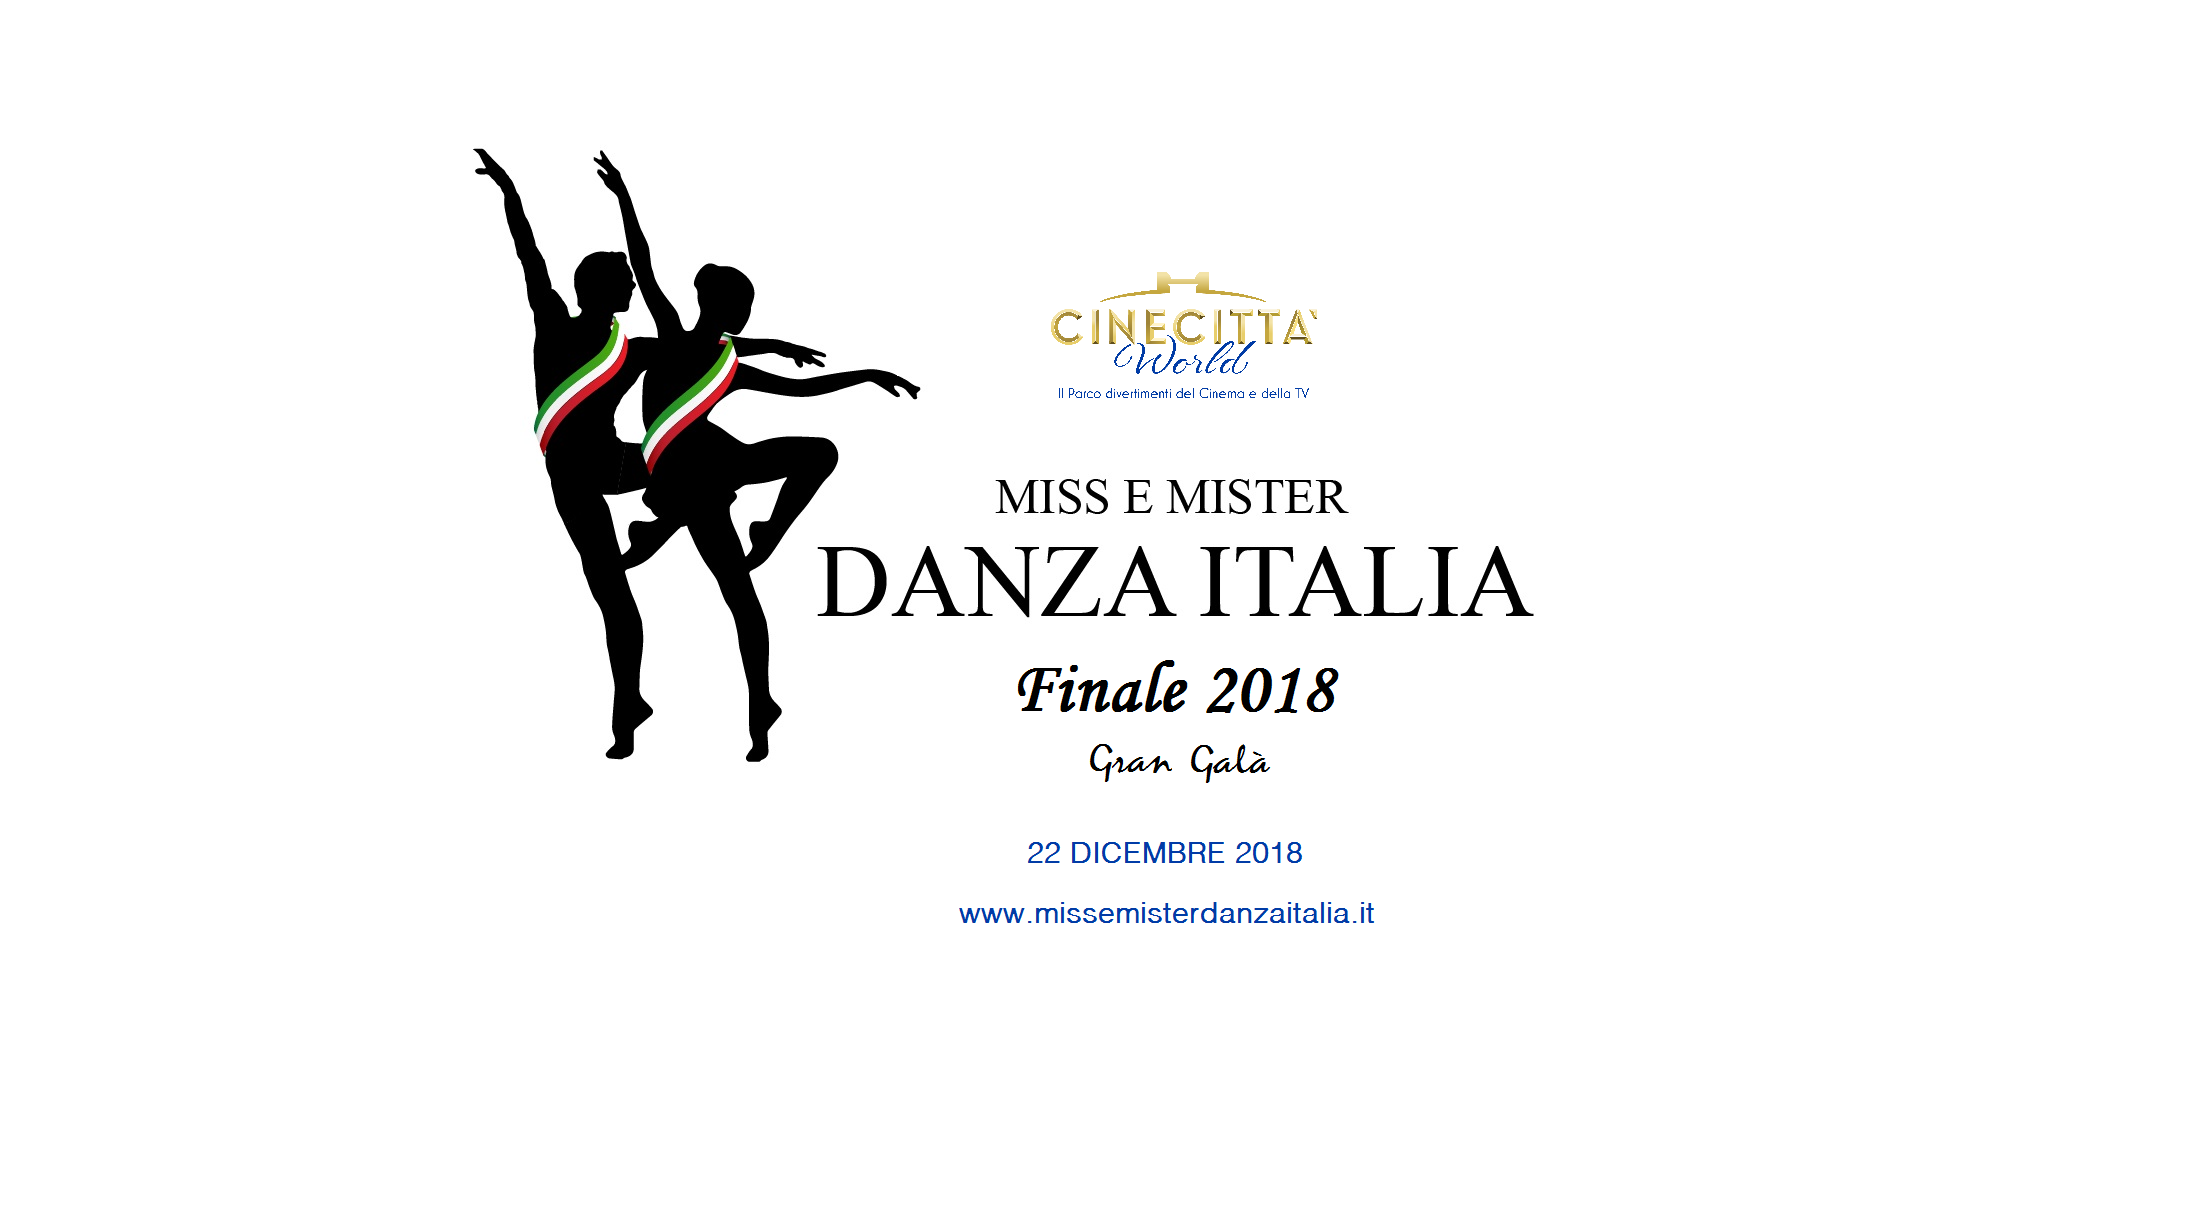 DANZA ITALIAAsset 122x-100